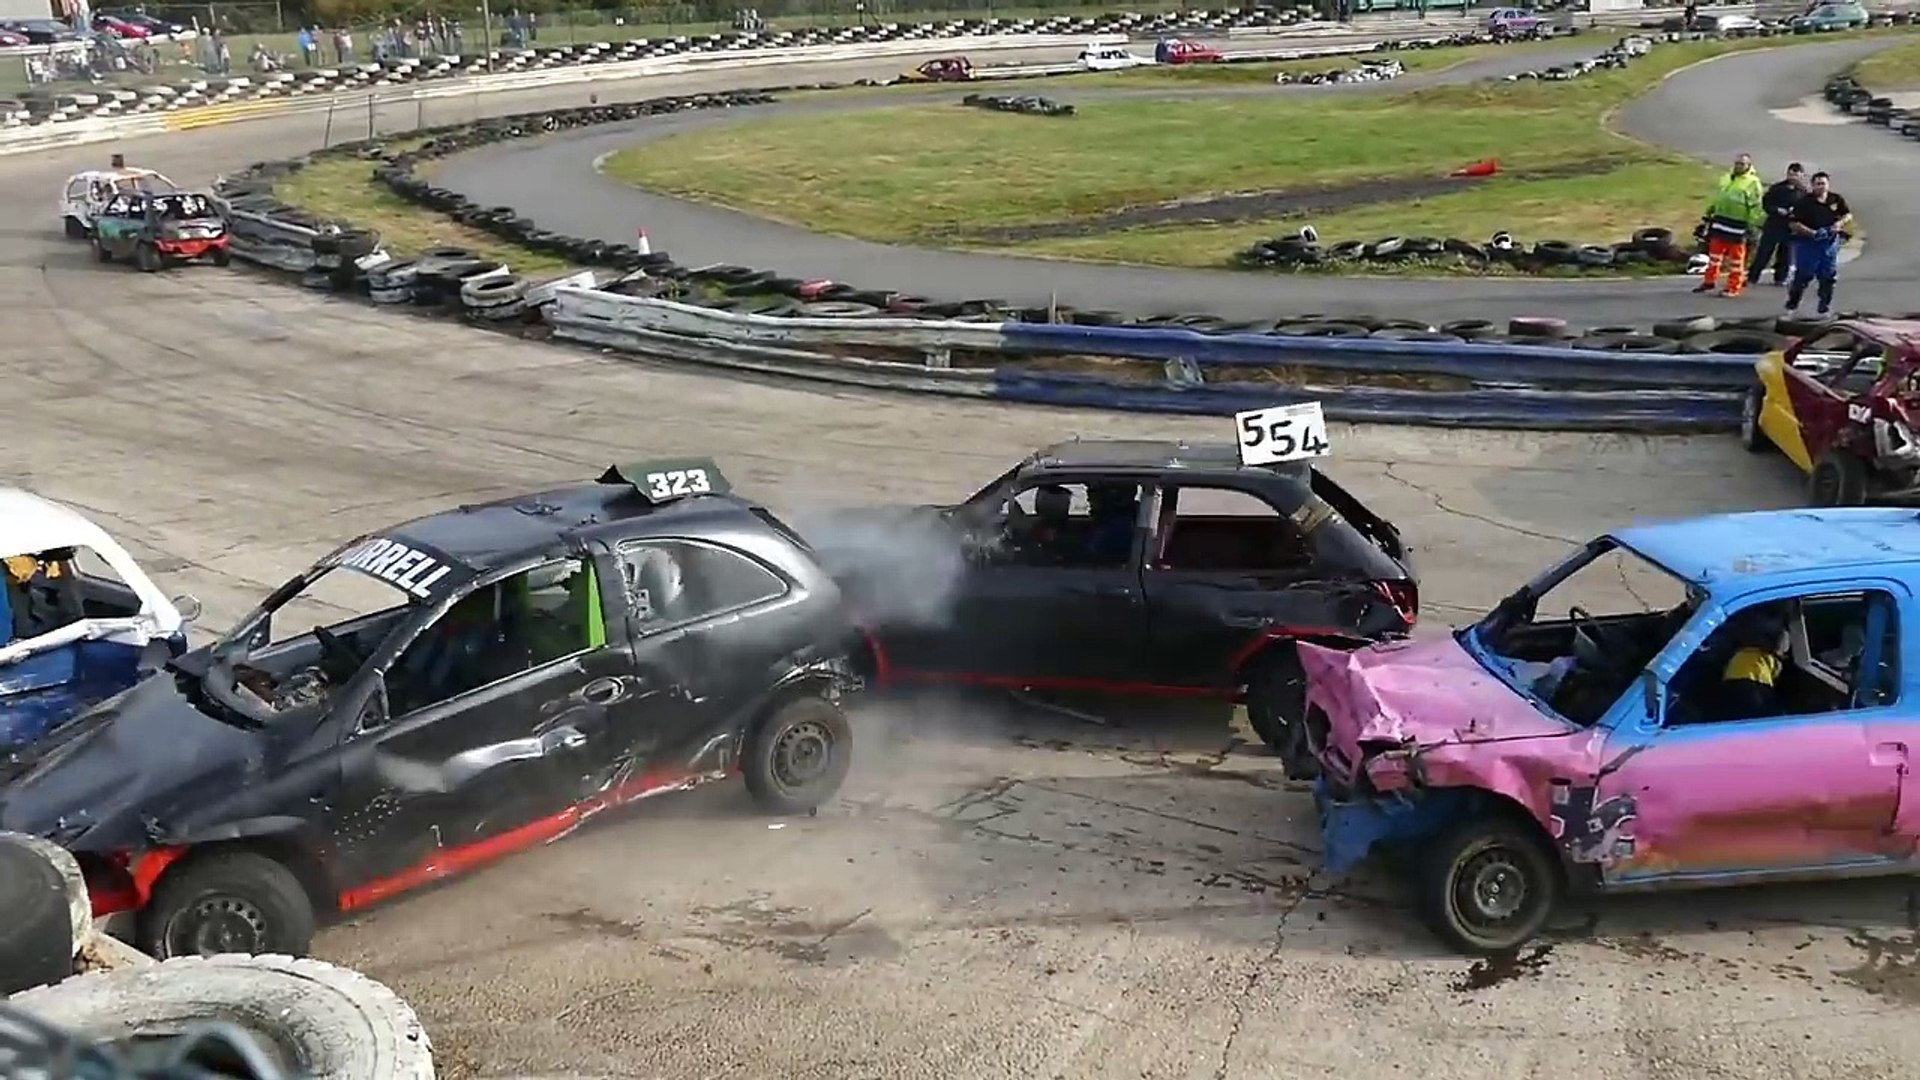 Banger Racing Angmering Oval Raceway World Final Highlights 30/10/2016